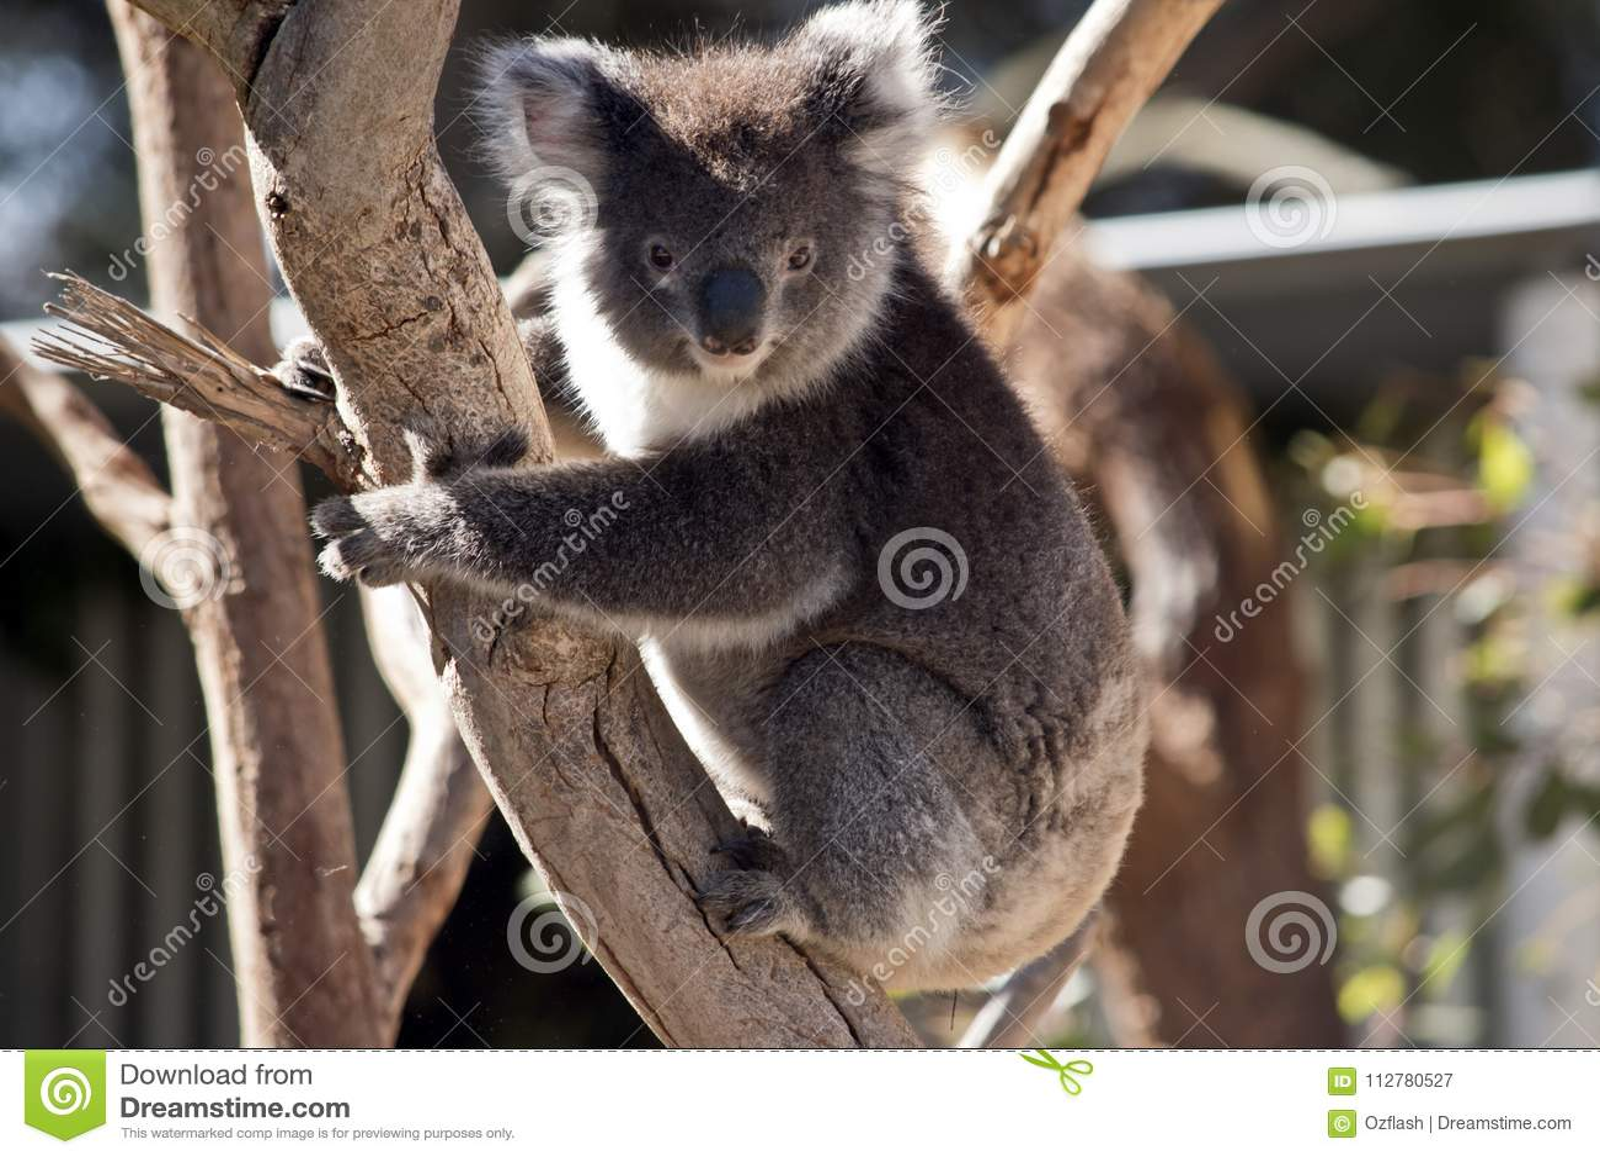 Koala upp utslagsplats